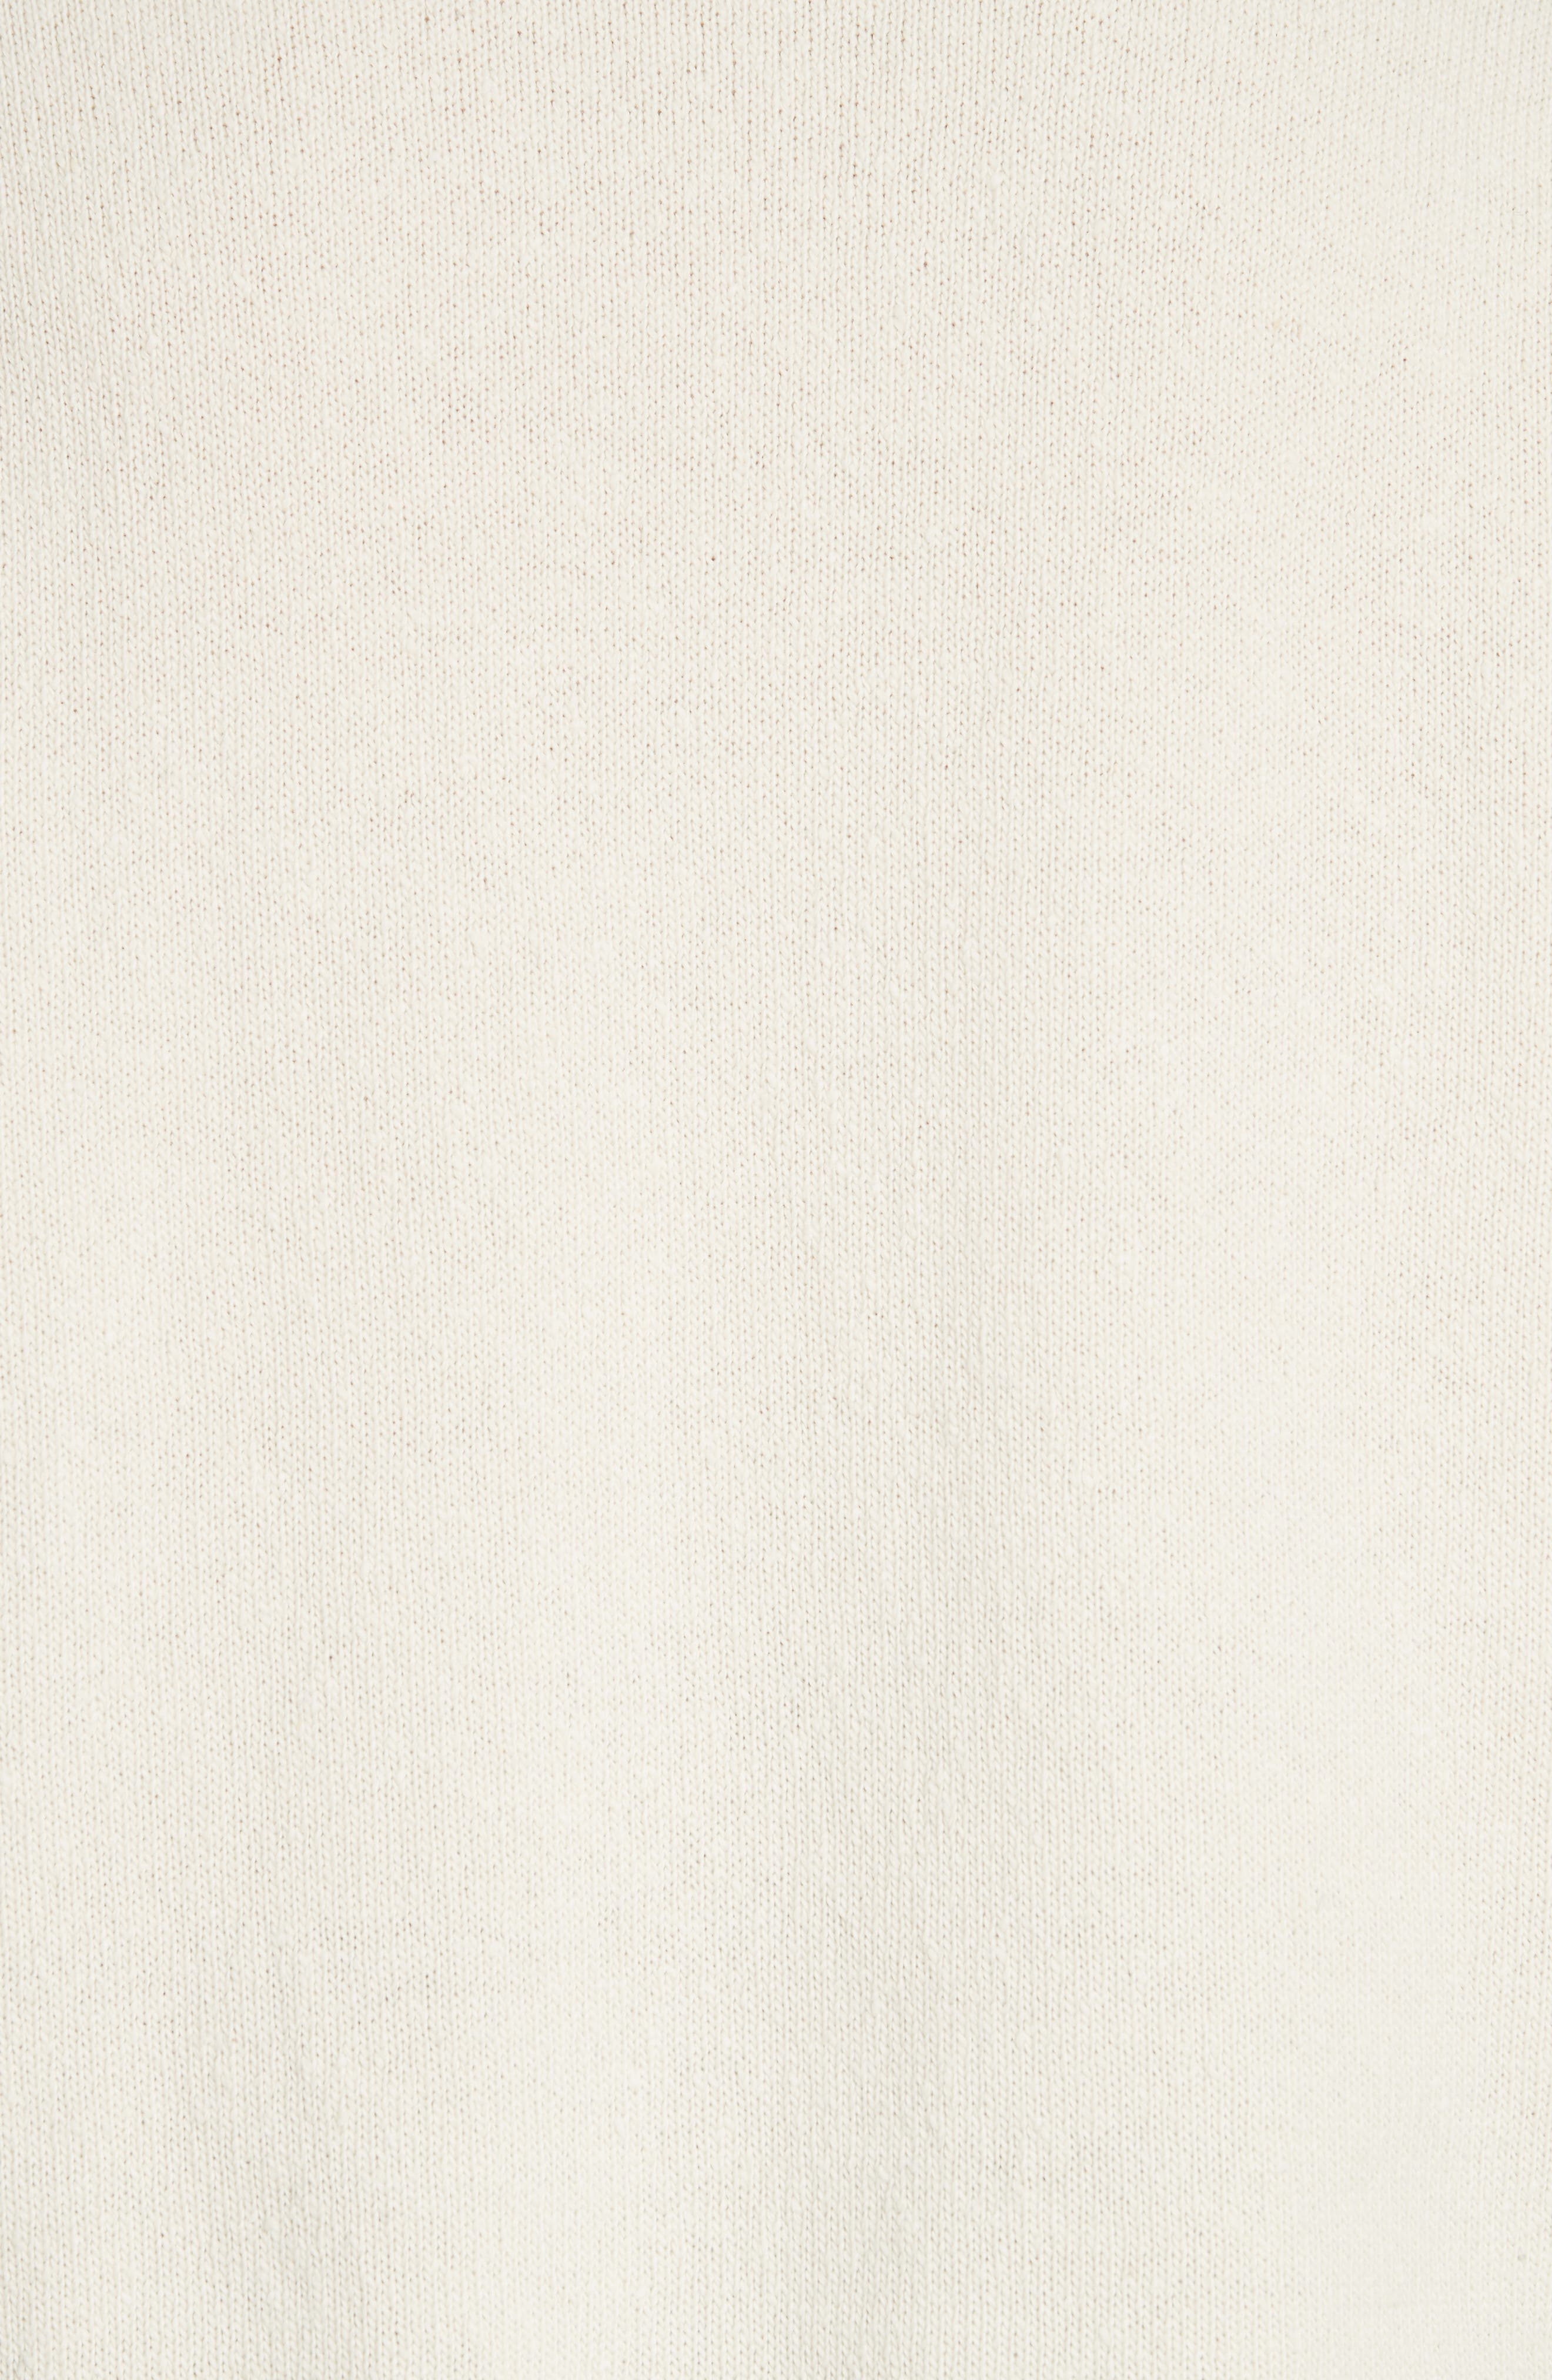 CALVIN KLEIN 205W39NYC,                             Print Wool Sweater,                             Alternate thumbnail 5, color,                             ECRU BLACK RED